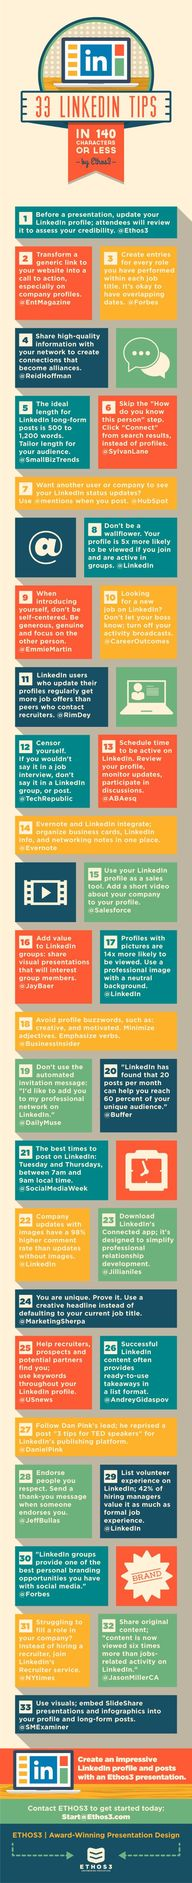 33 Linkedin Tips | P